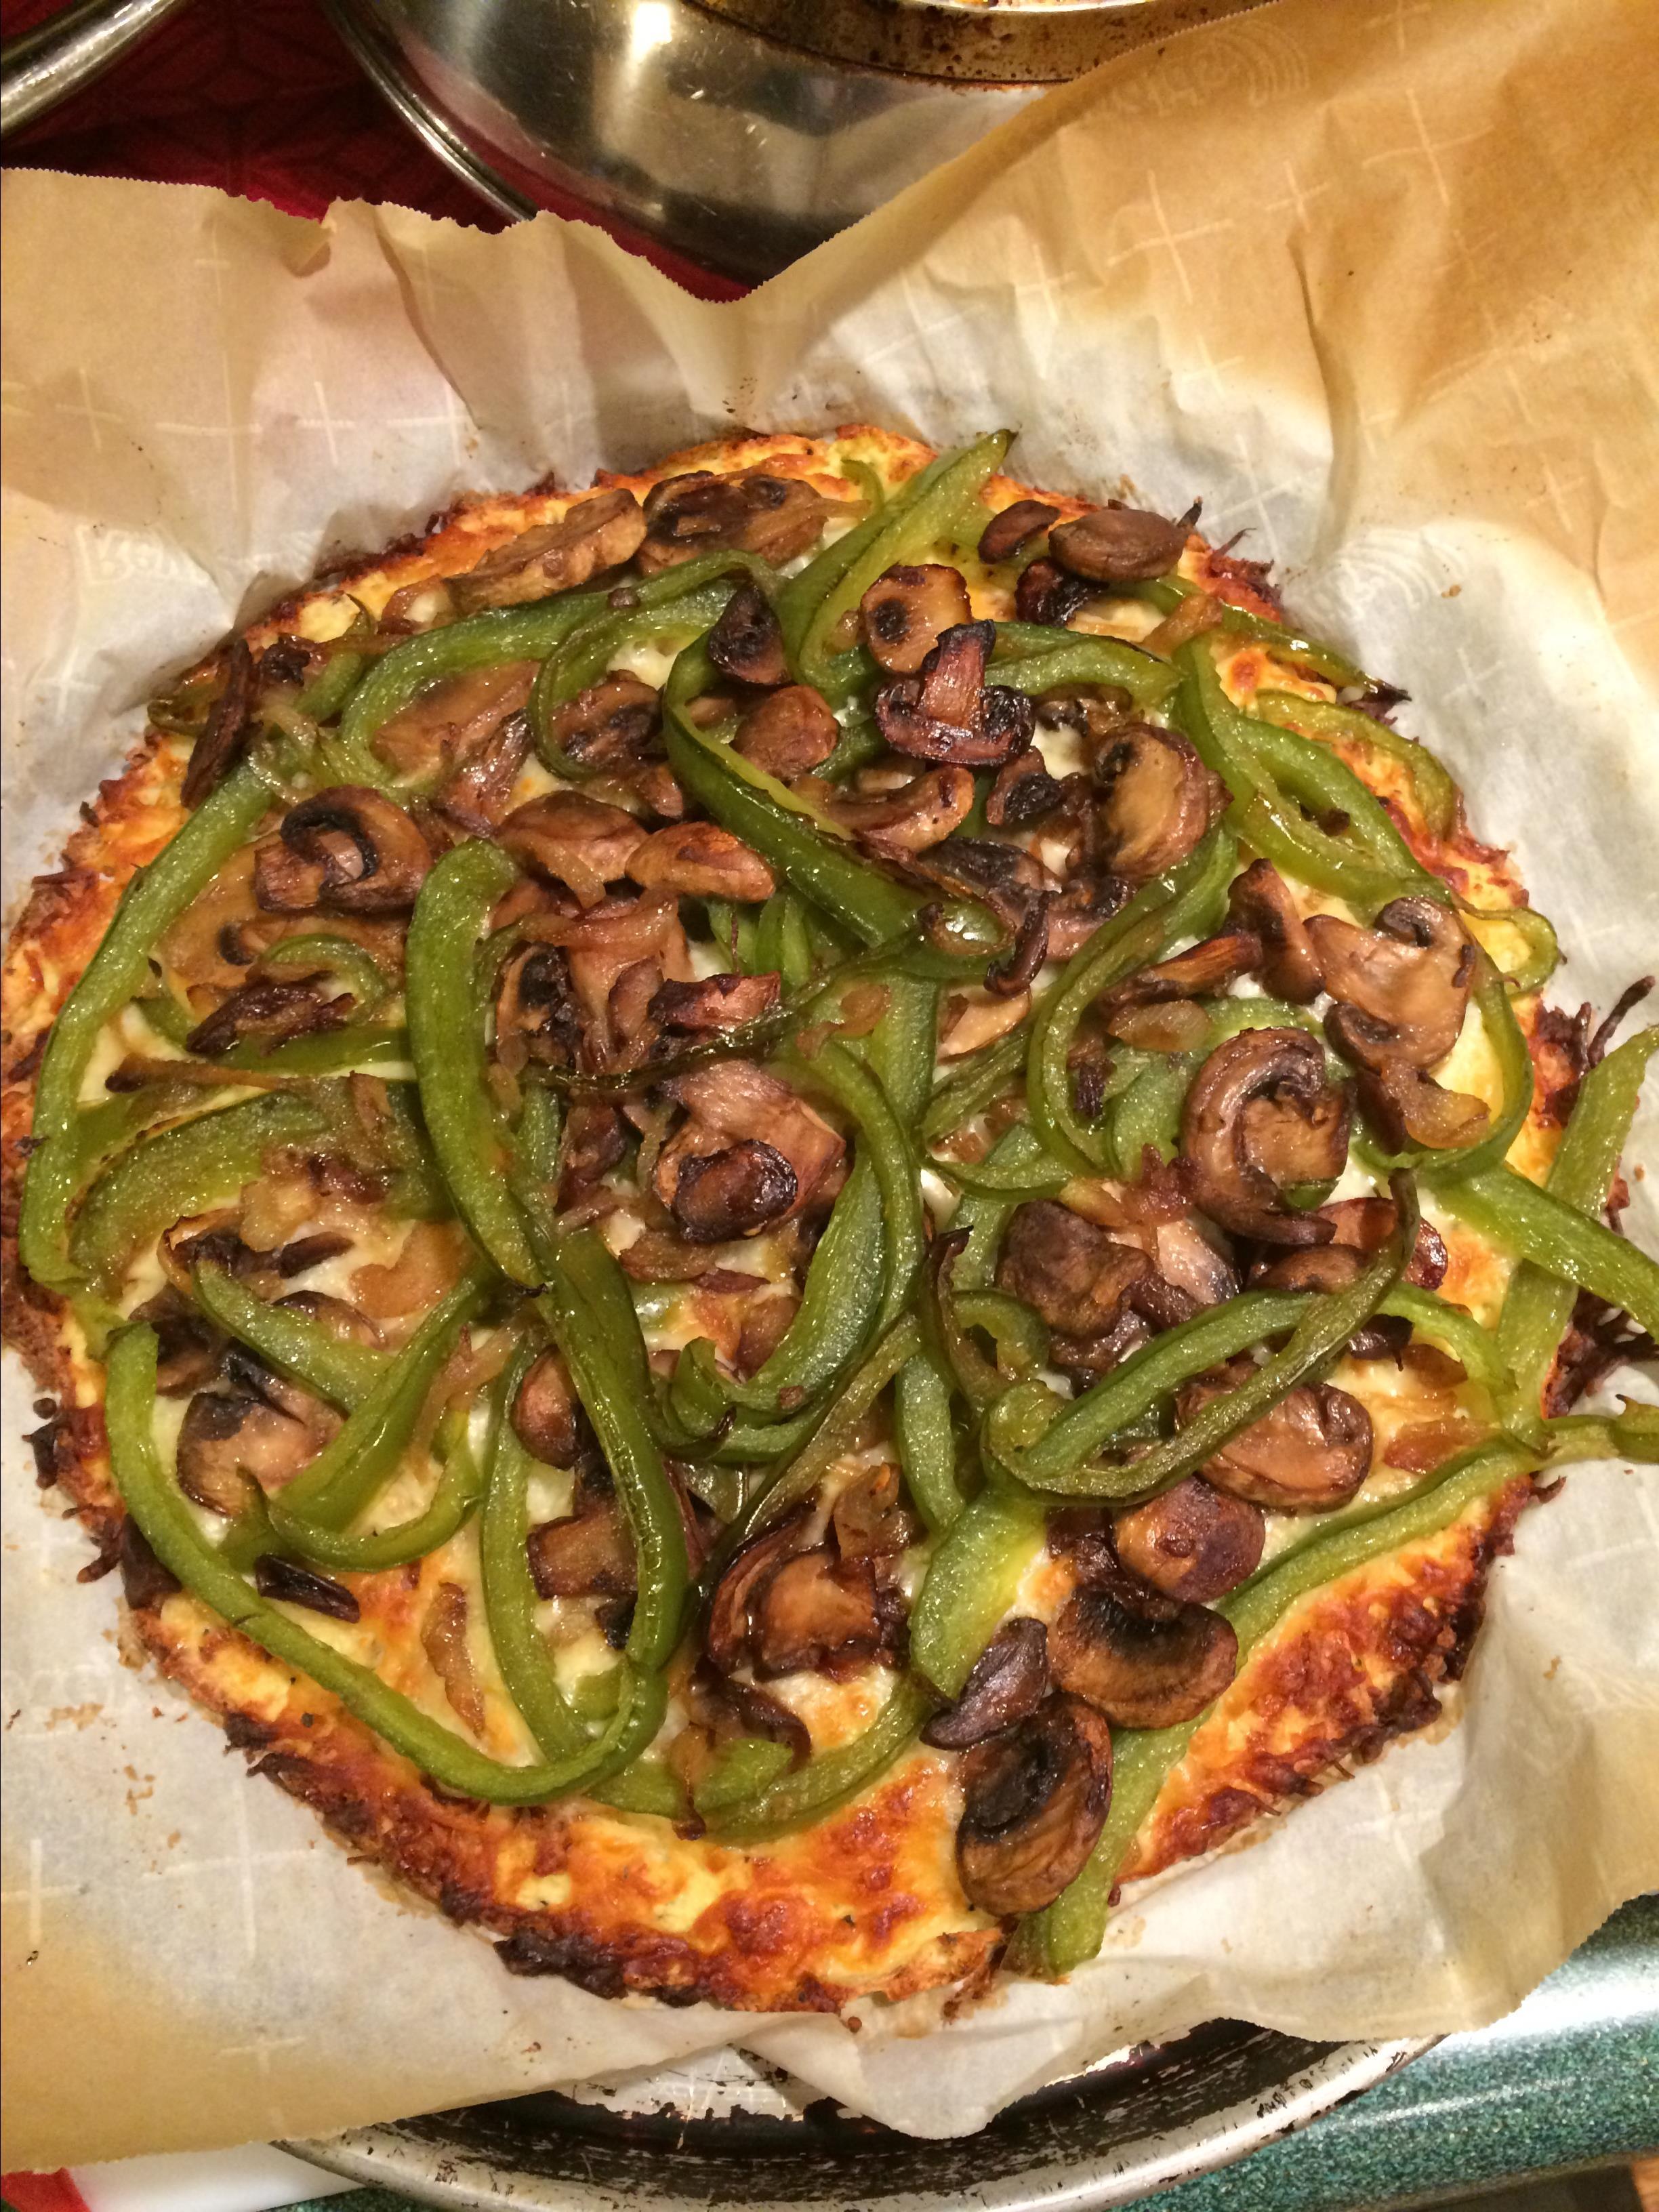 Cheesy Cauliflower Pizza Crust jeannealexander63@comcast.net